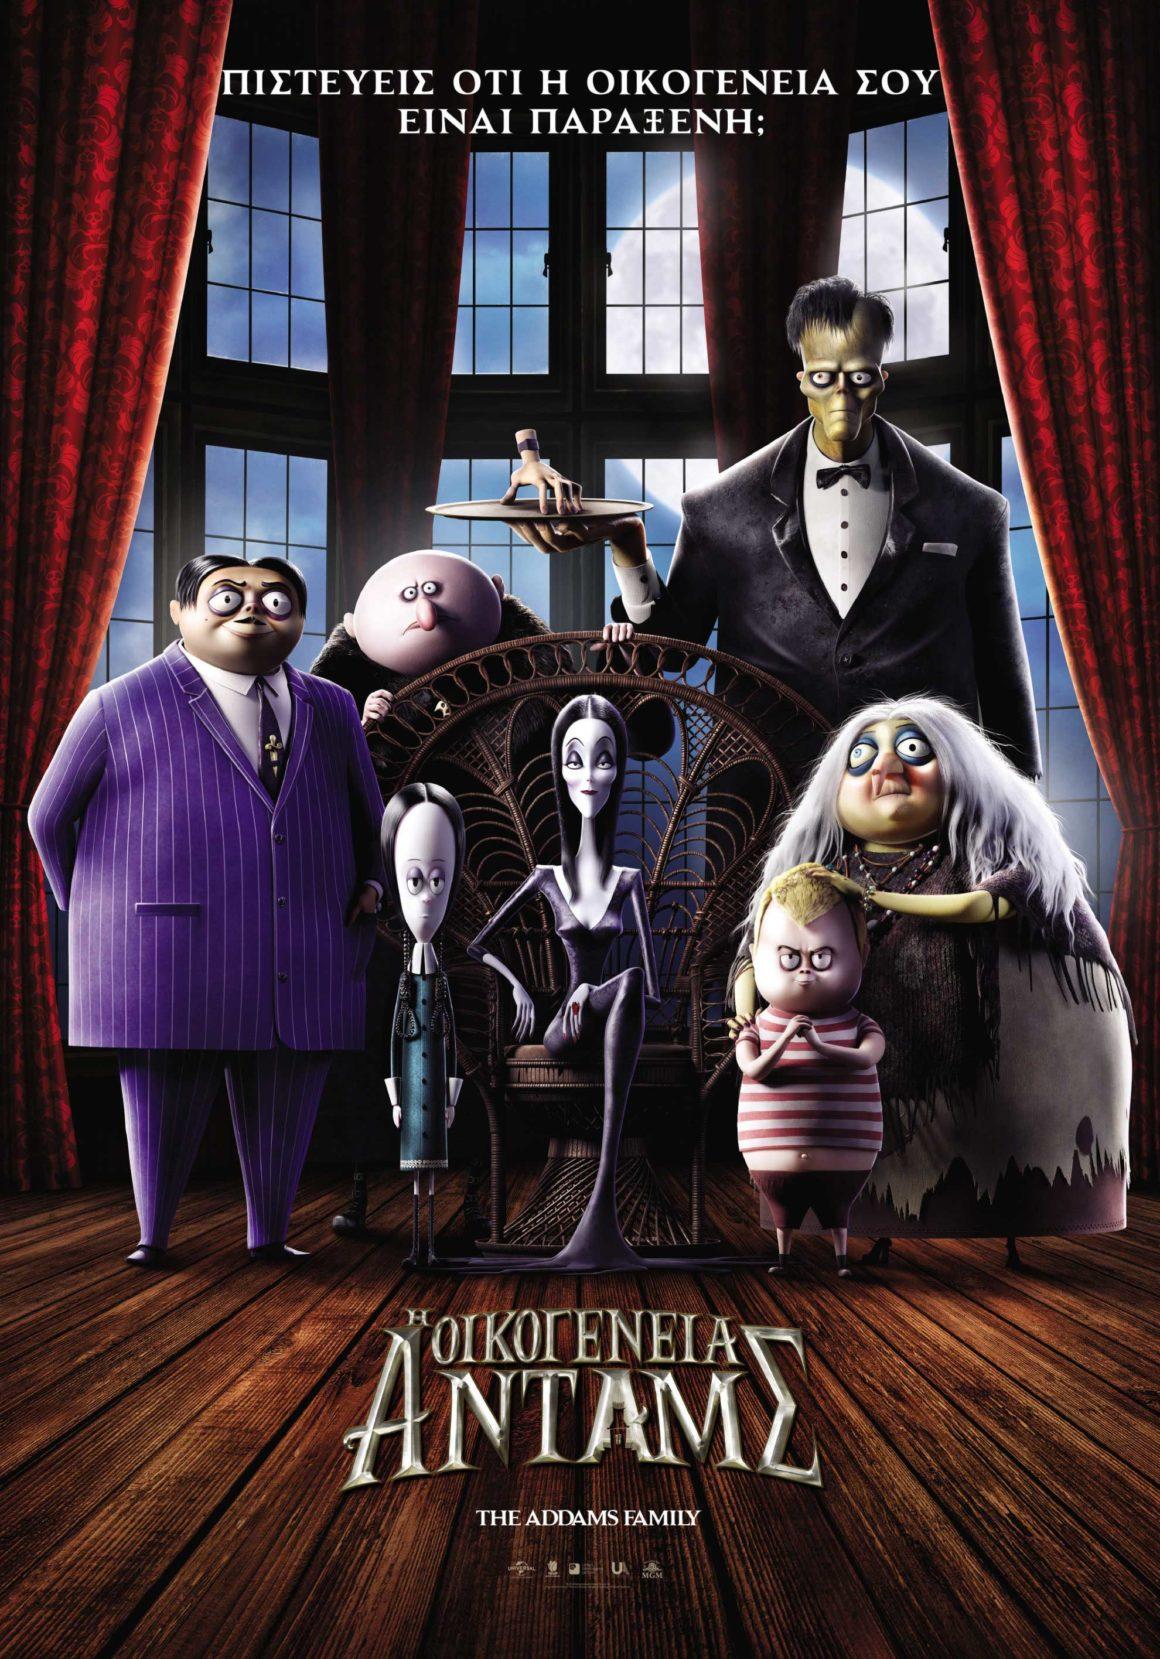 The Addams Family / Η Οικογένεια Άνταμς (ΜΕΤΑΓΛΩΤΤΙΣΜΕΝΟ) ΚΑΙ ΣΕ 3D